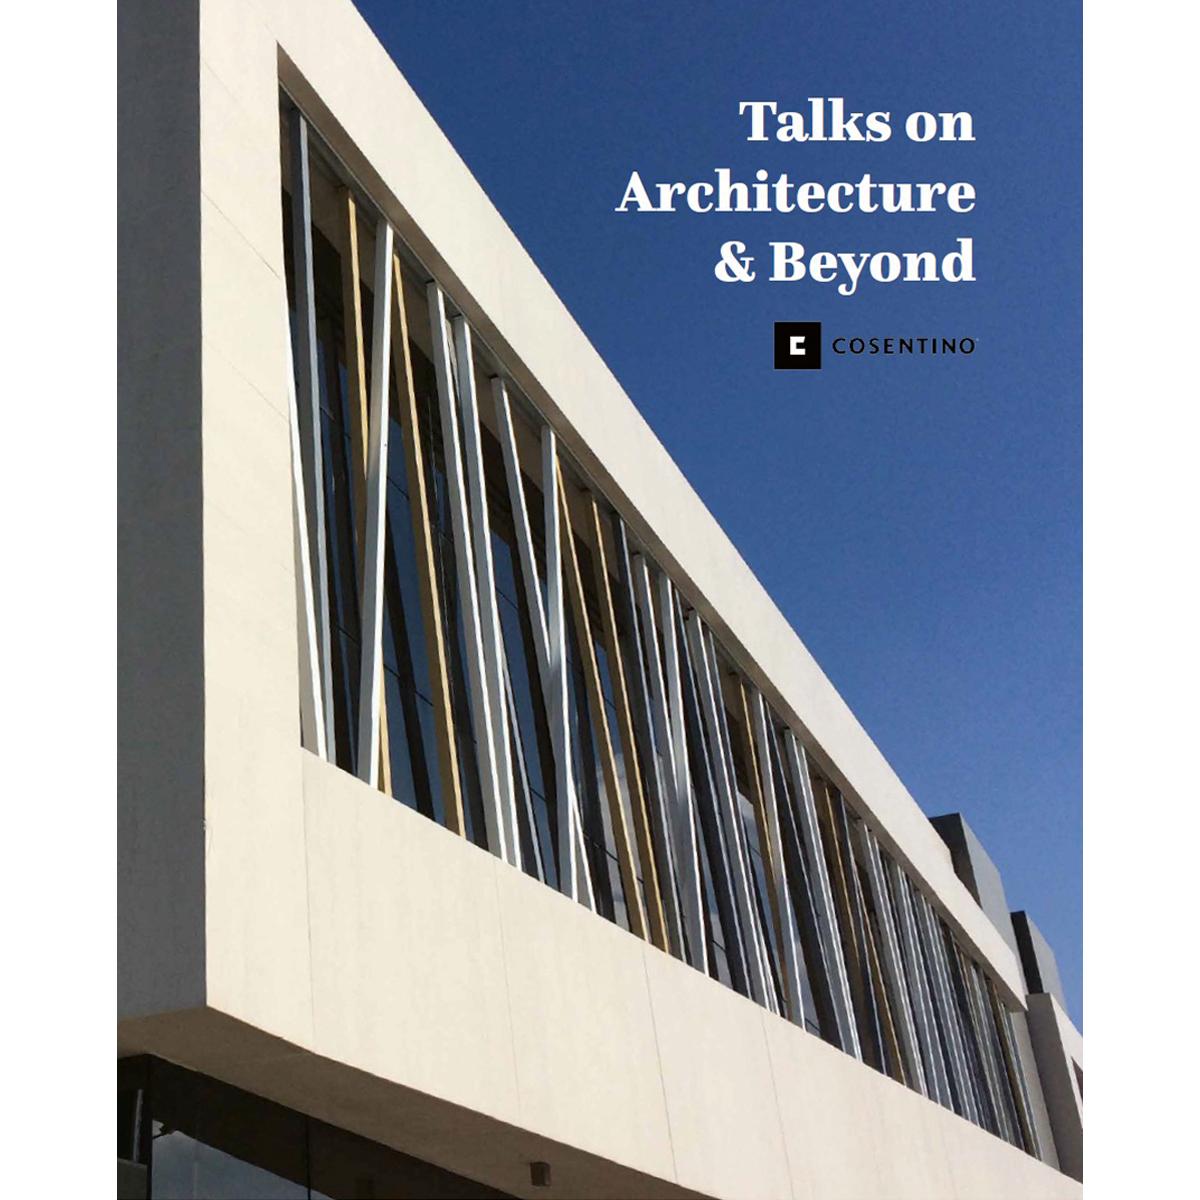 Talks on Architecture & Beyond